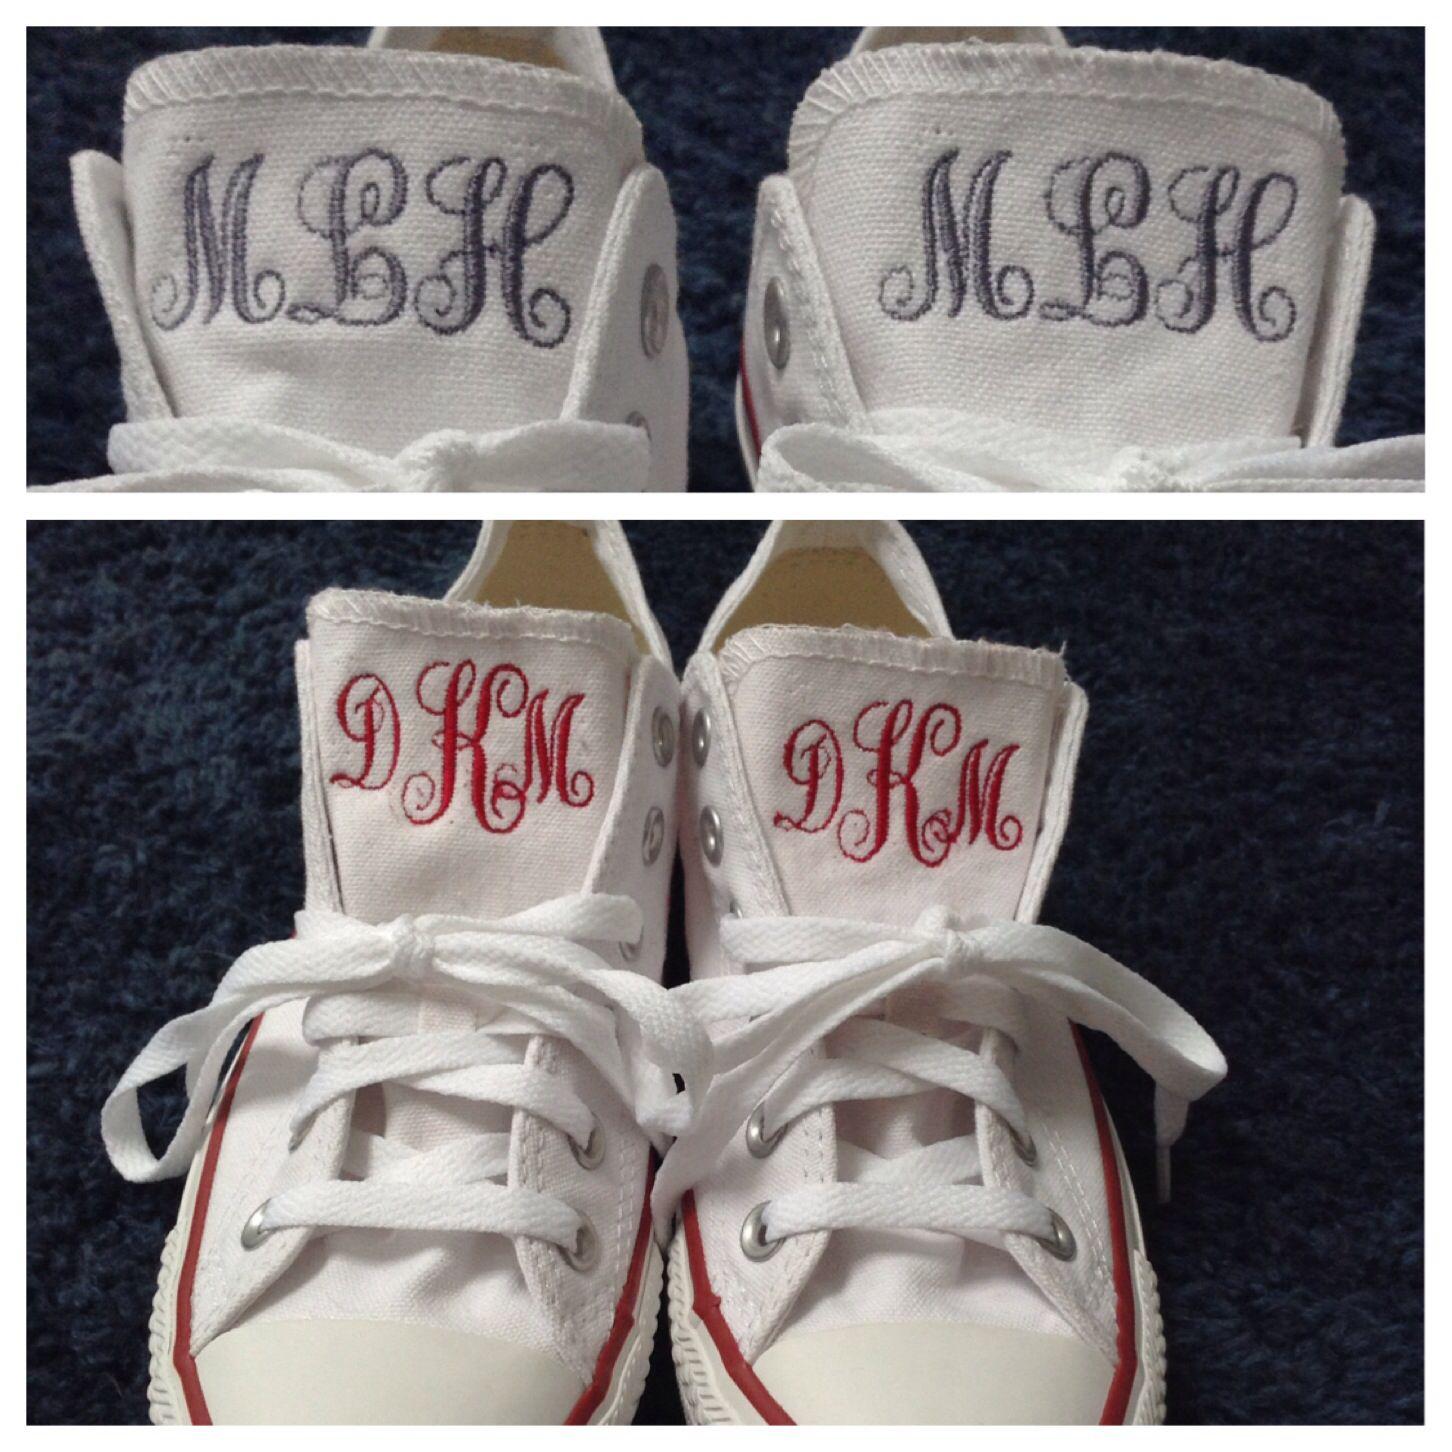 Monogrammed Converse sneakers.  What fun!   https://www.etsy.com/listing/200827540/monogram-sneakers-converse